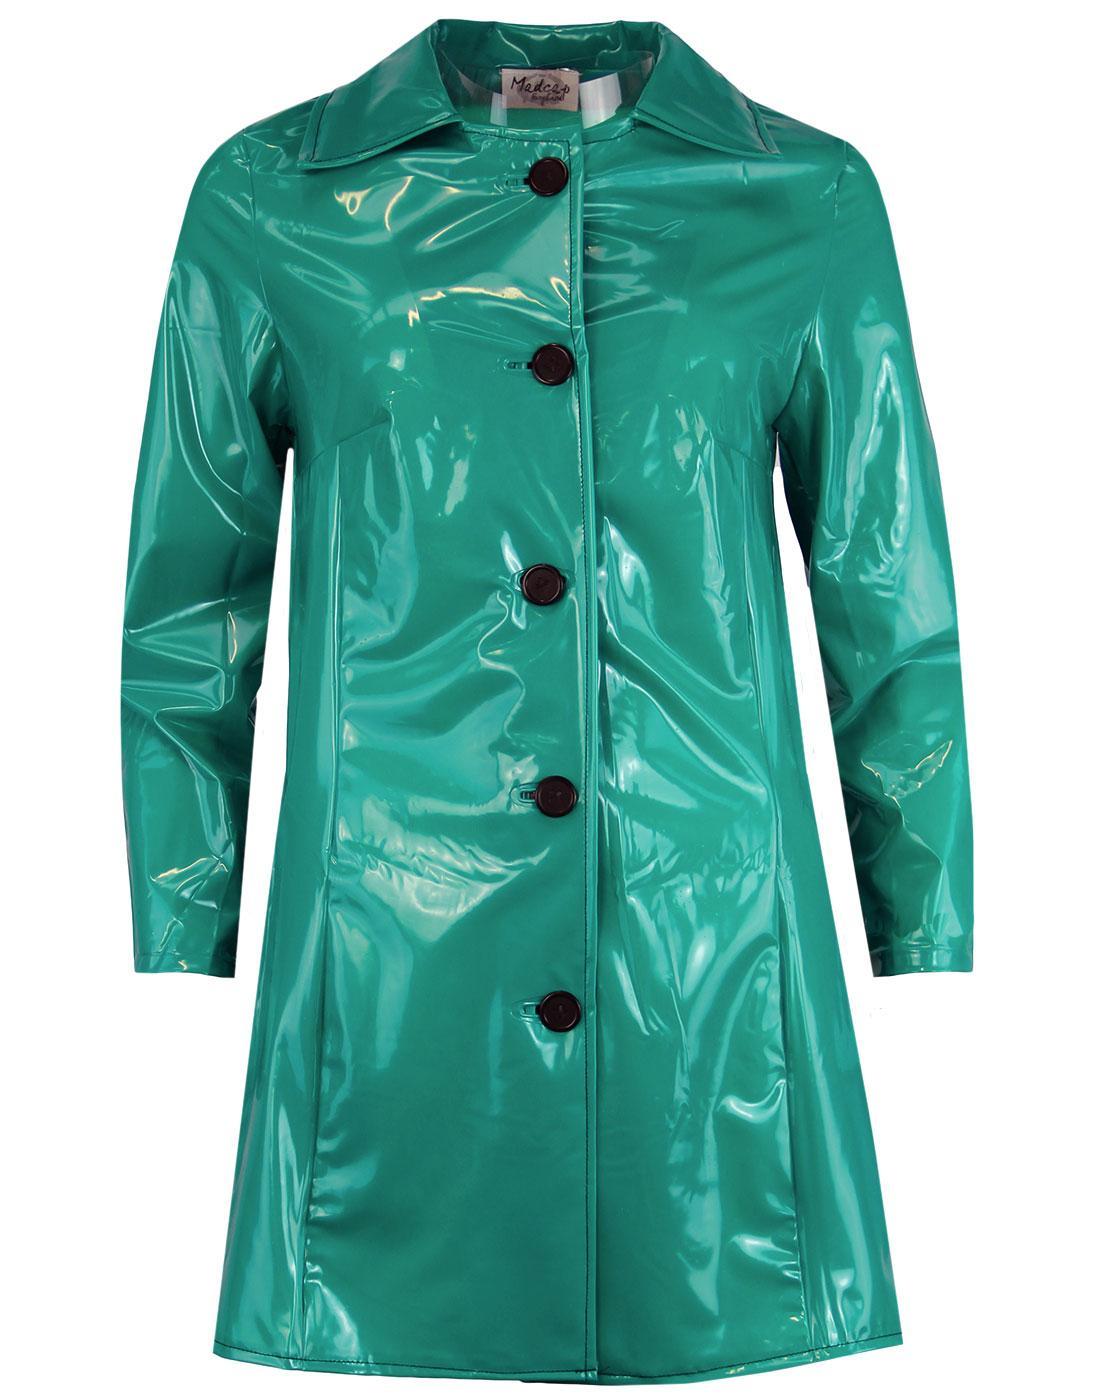 madcap england jackie 60s mod pvc raincoat green